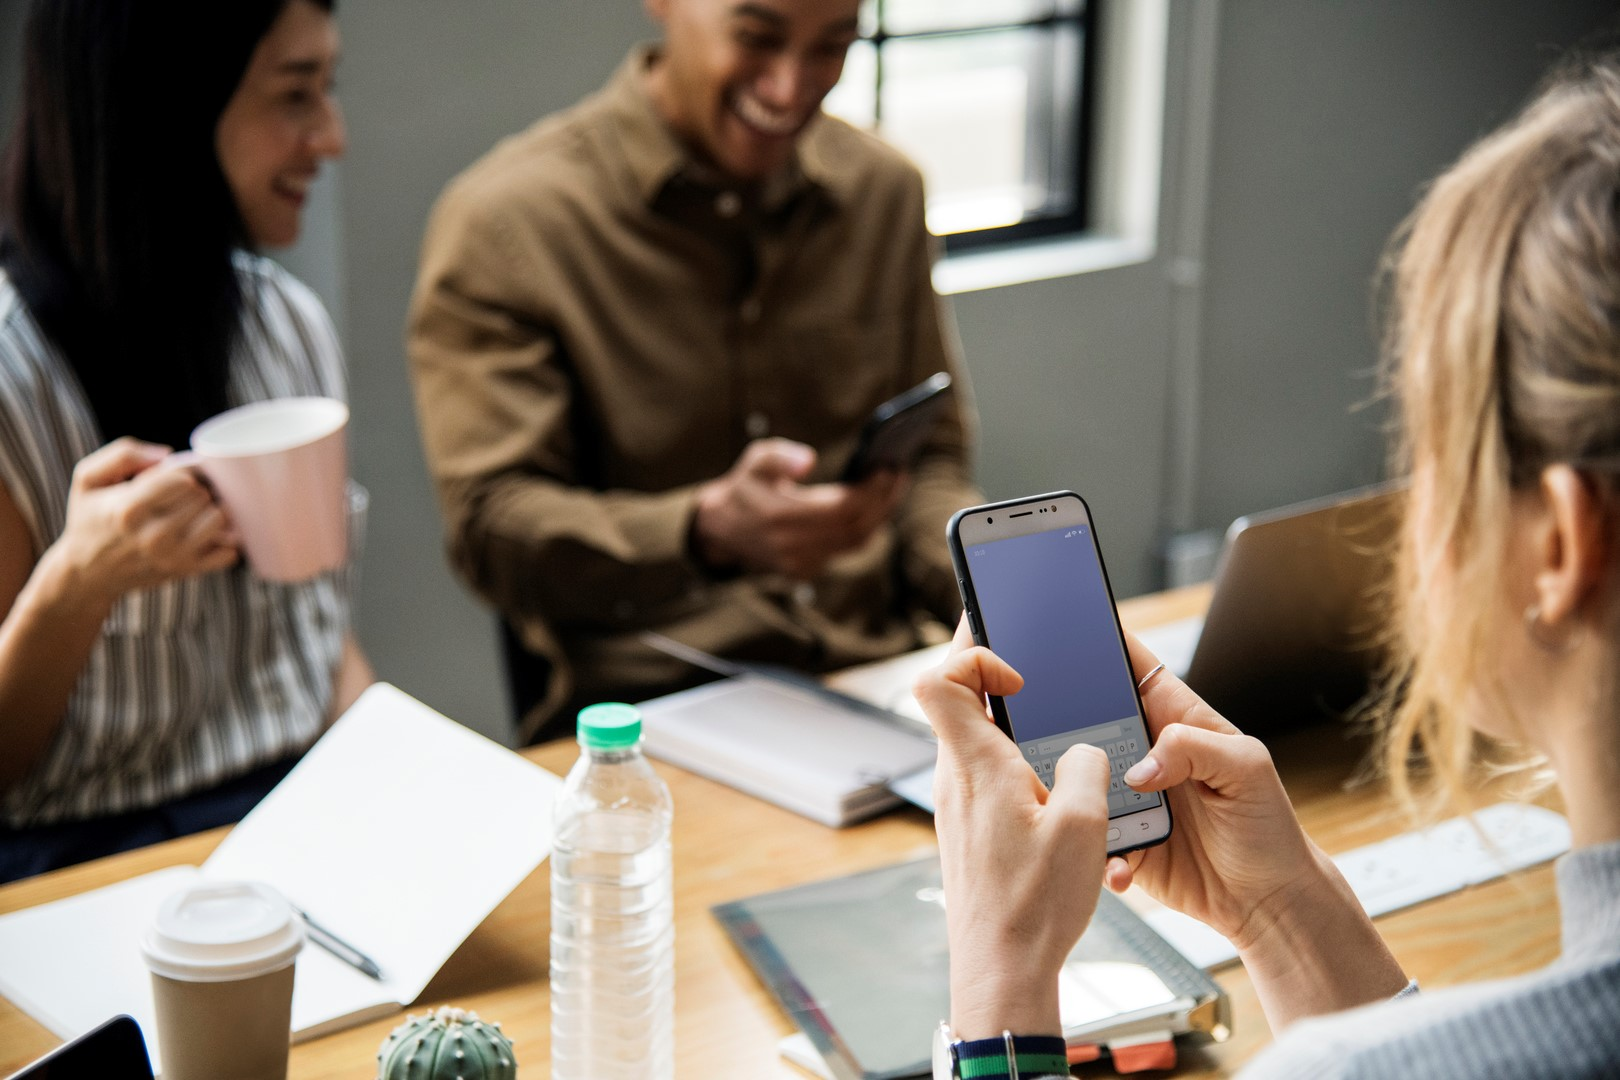 Smartphones & tablets για φοιτητές: κράτα σημειώσεις!